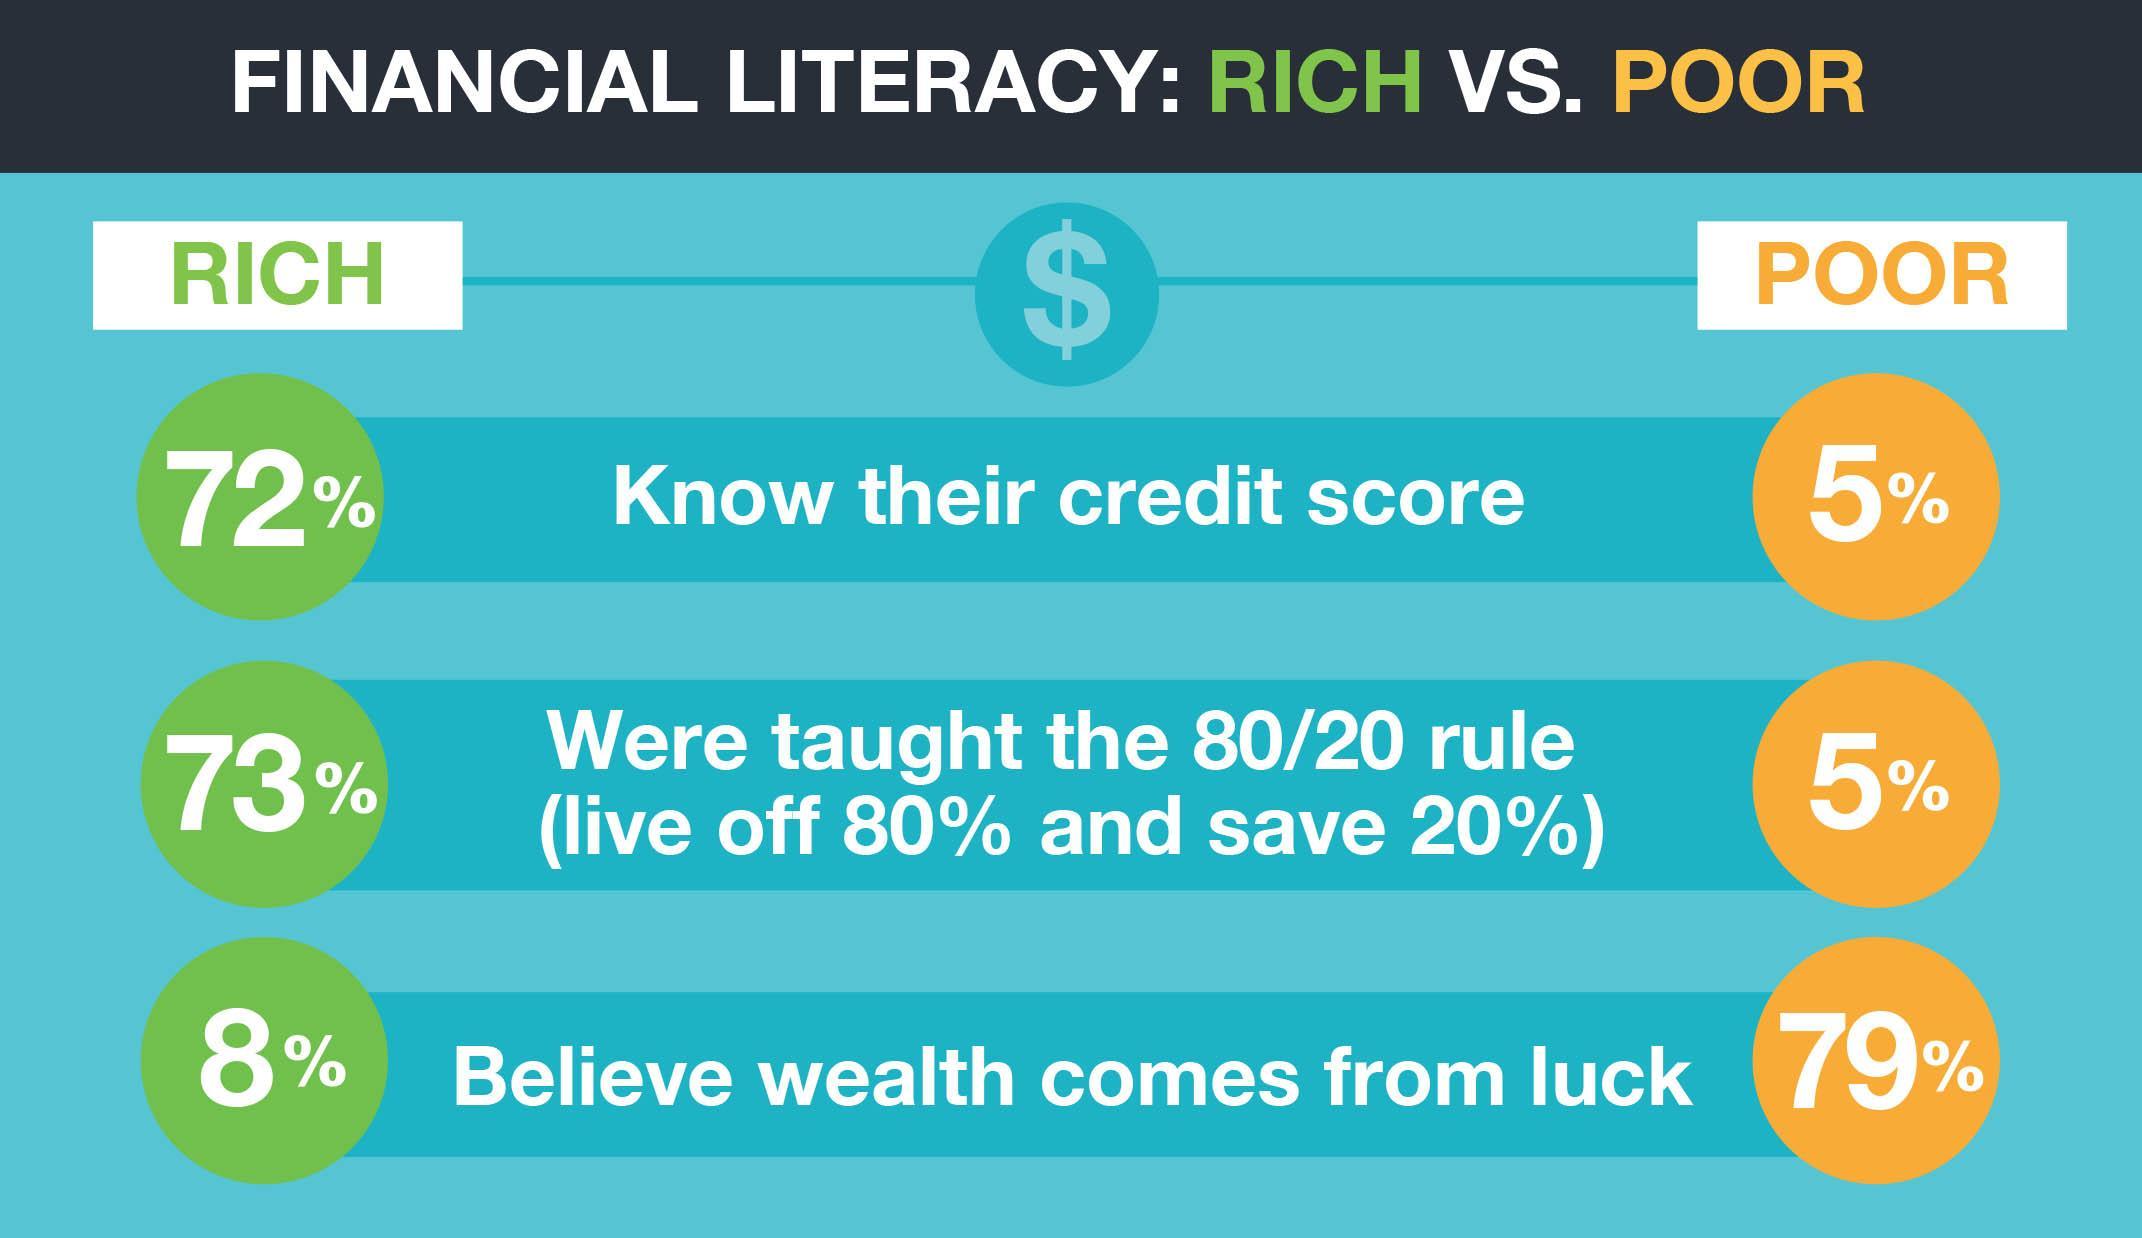 Financial literacy in poor vs rich people